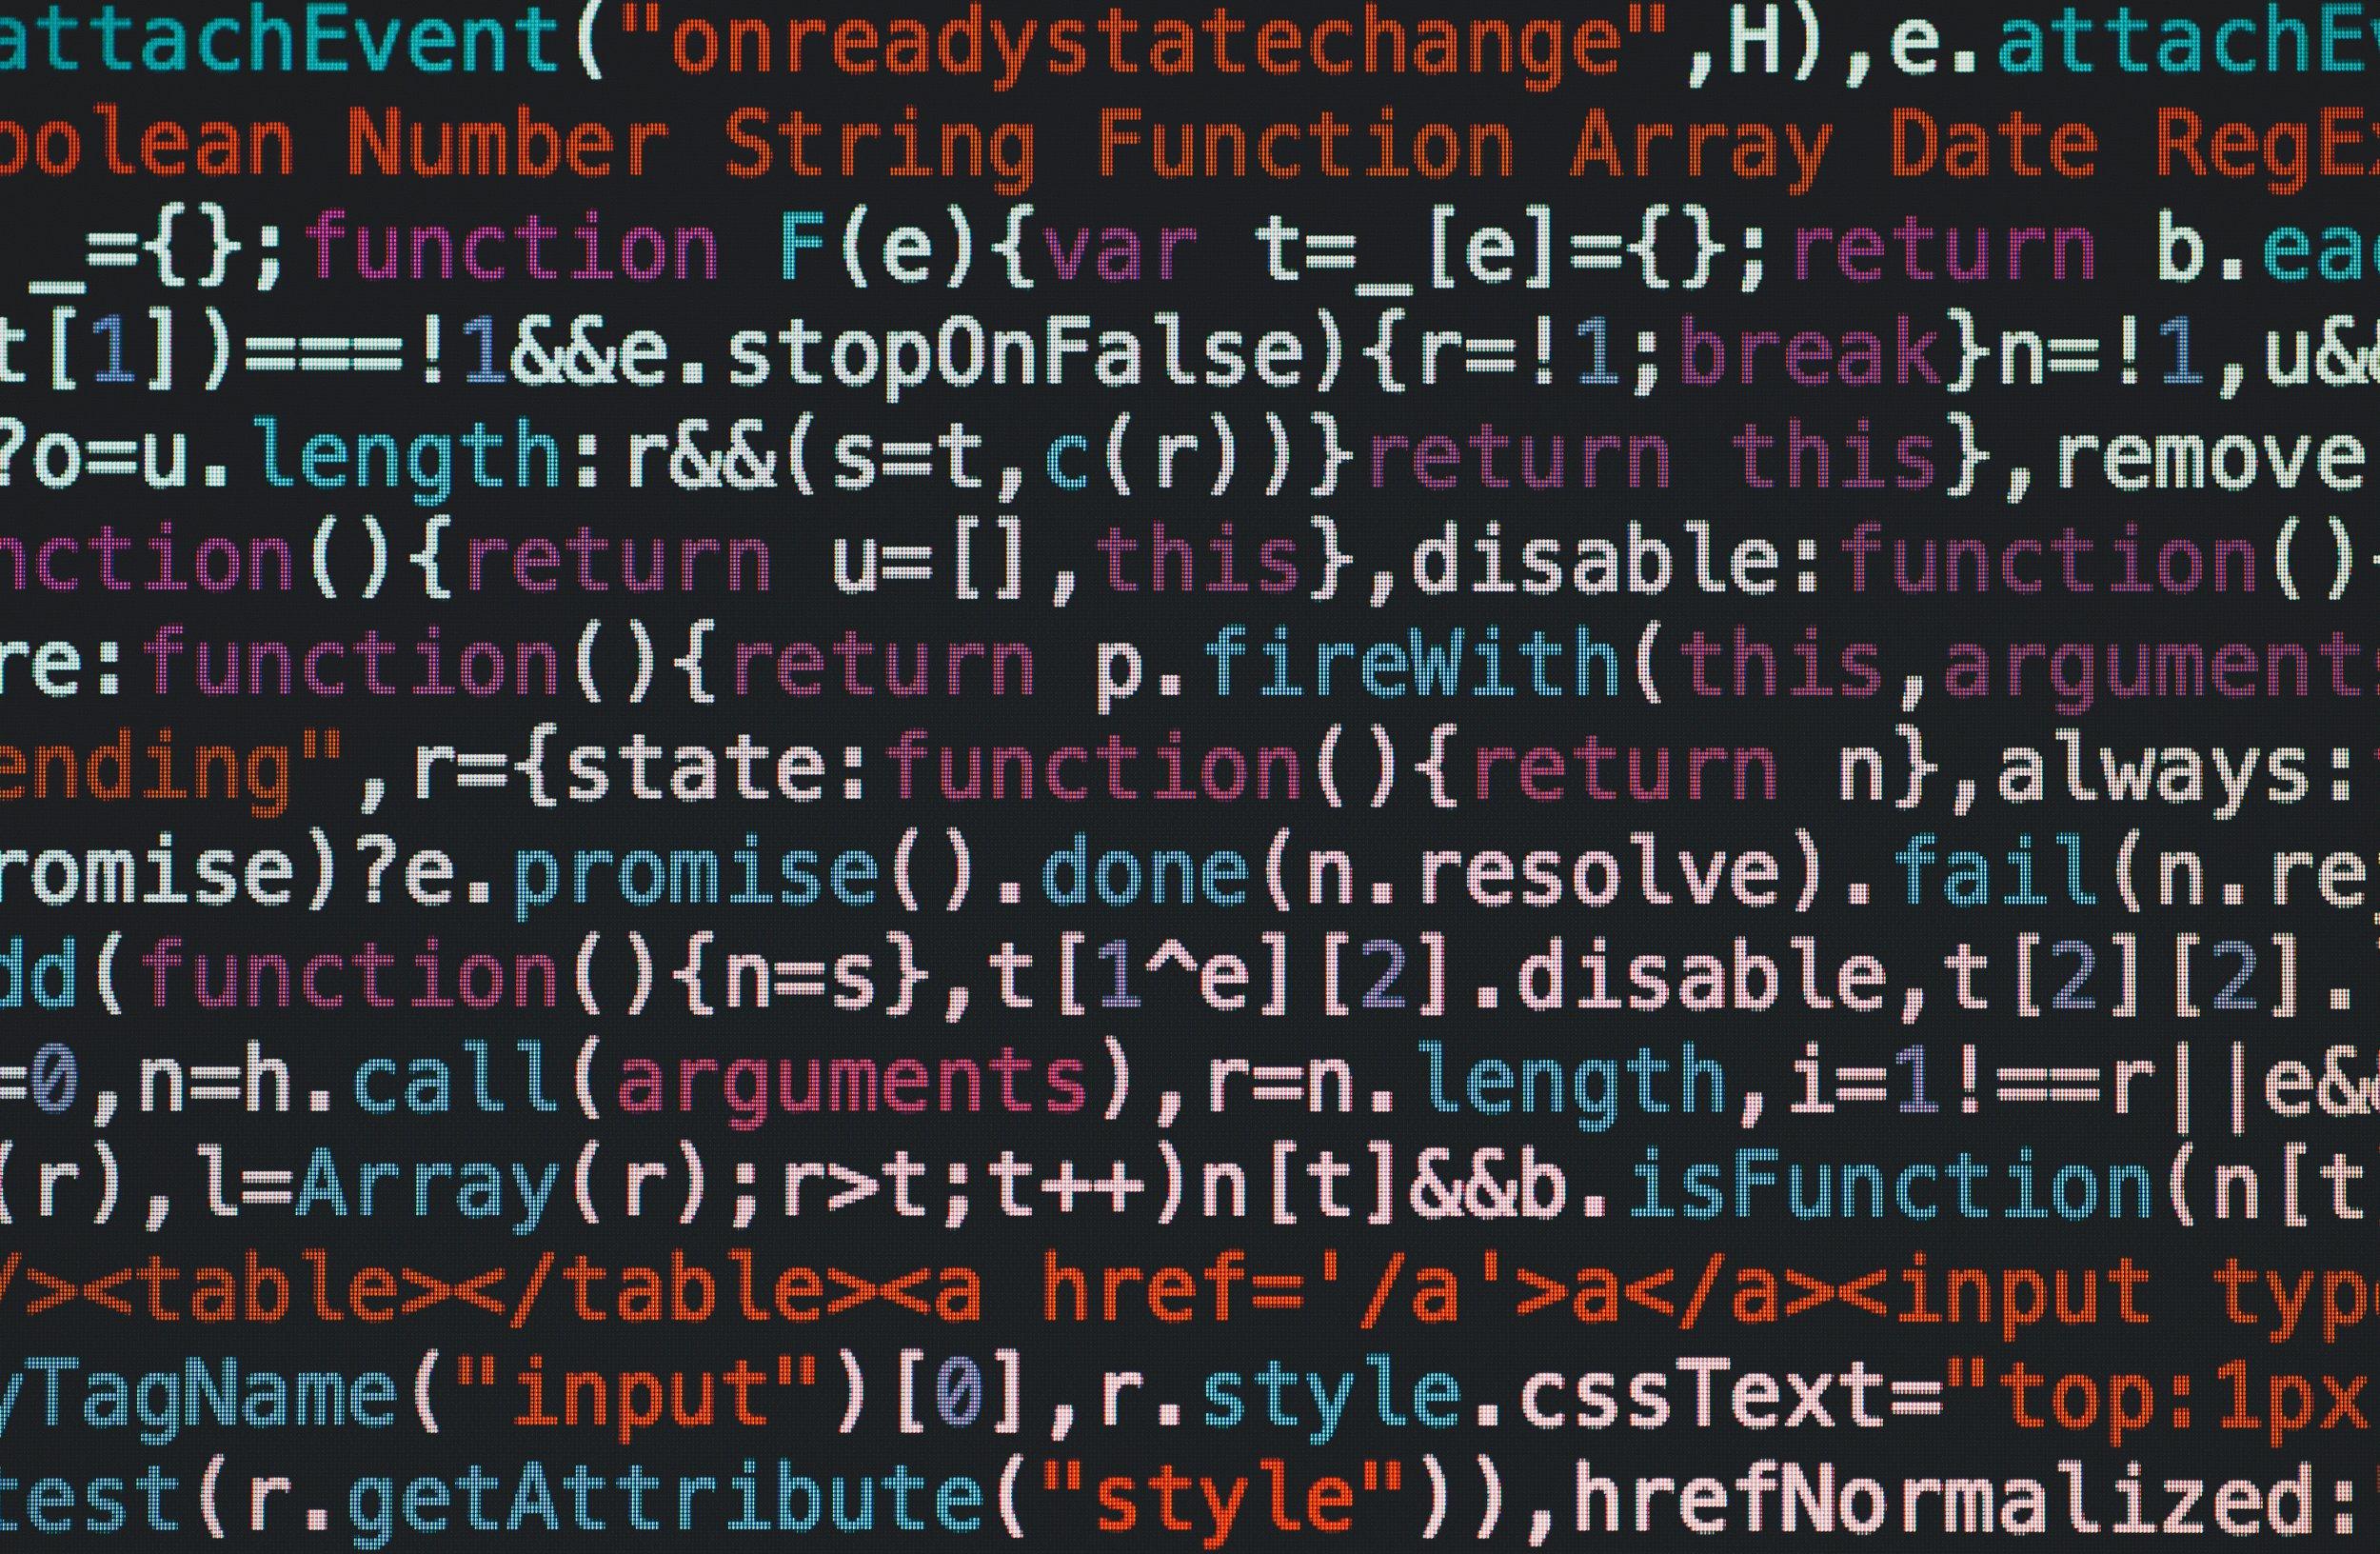 Privacy_Data_markus-spiske-518966-unsplash.jpg